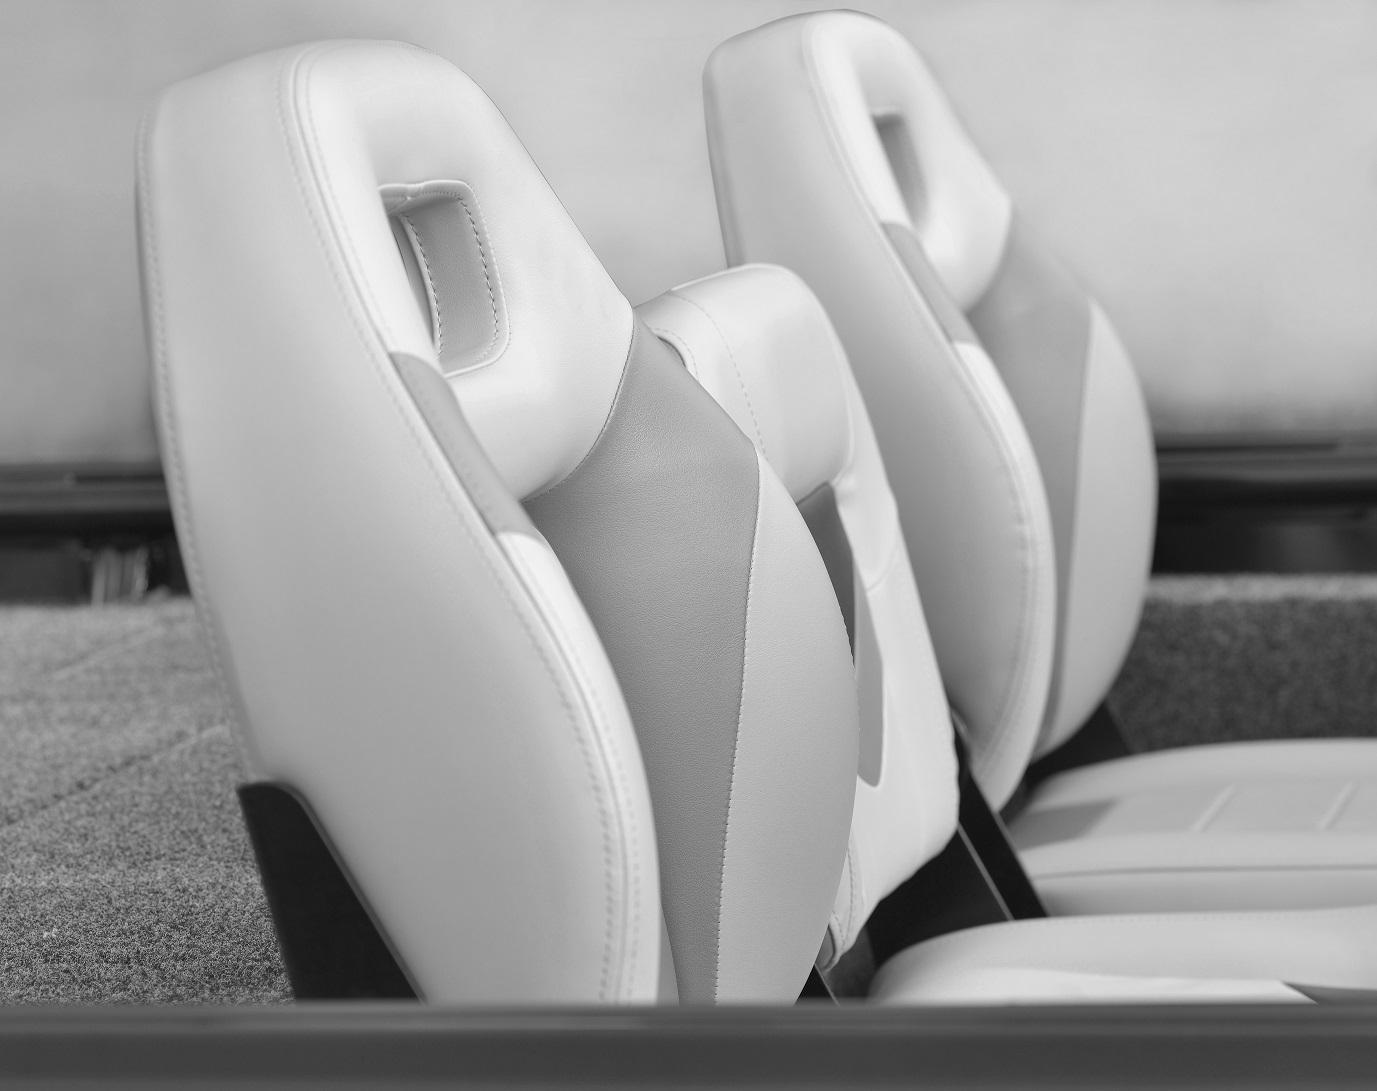 Bass Pro row seats